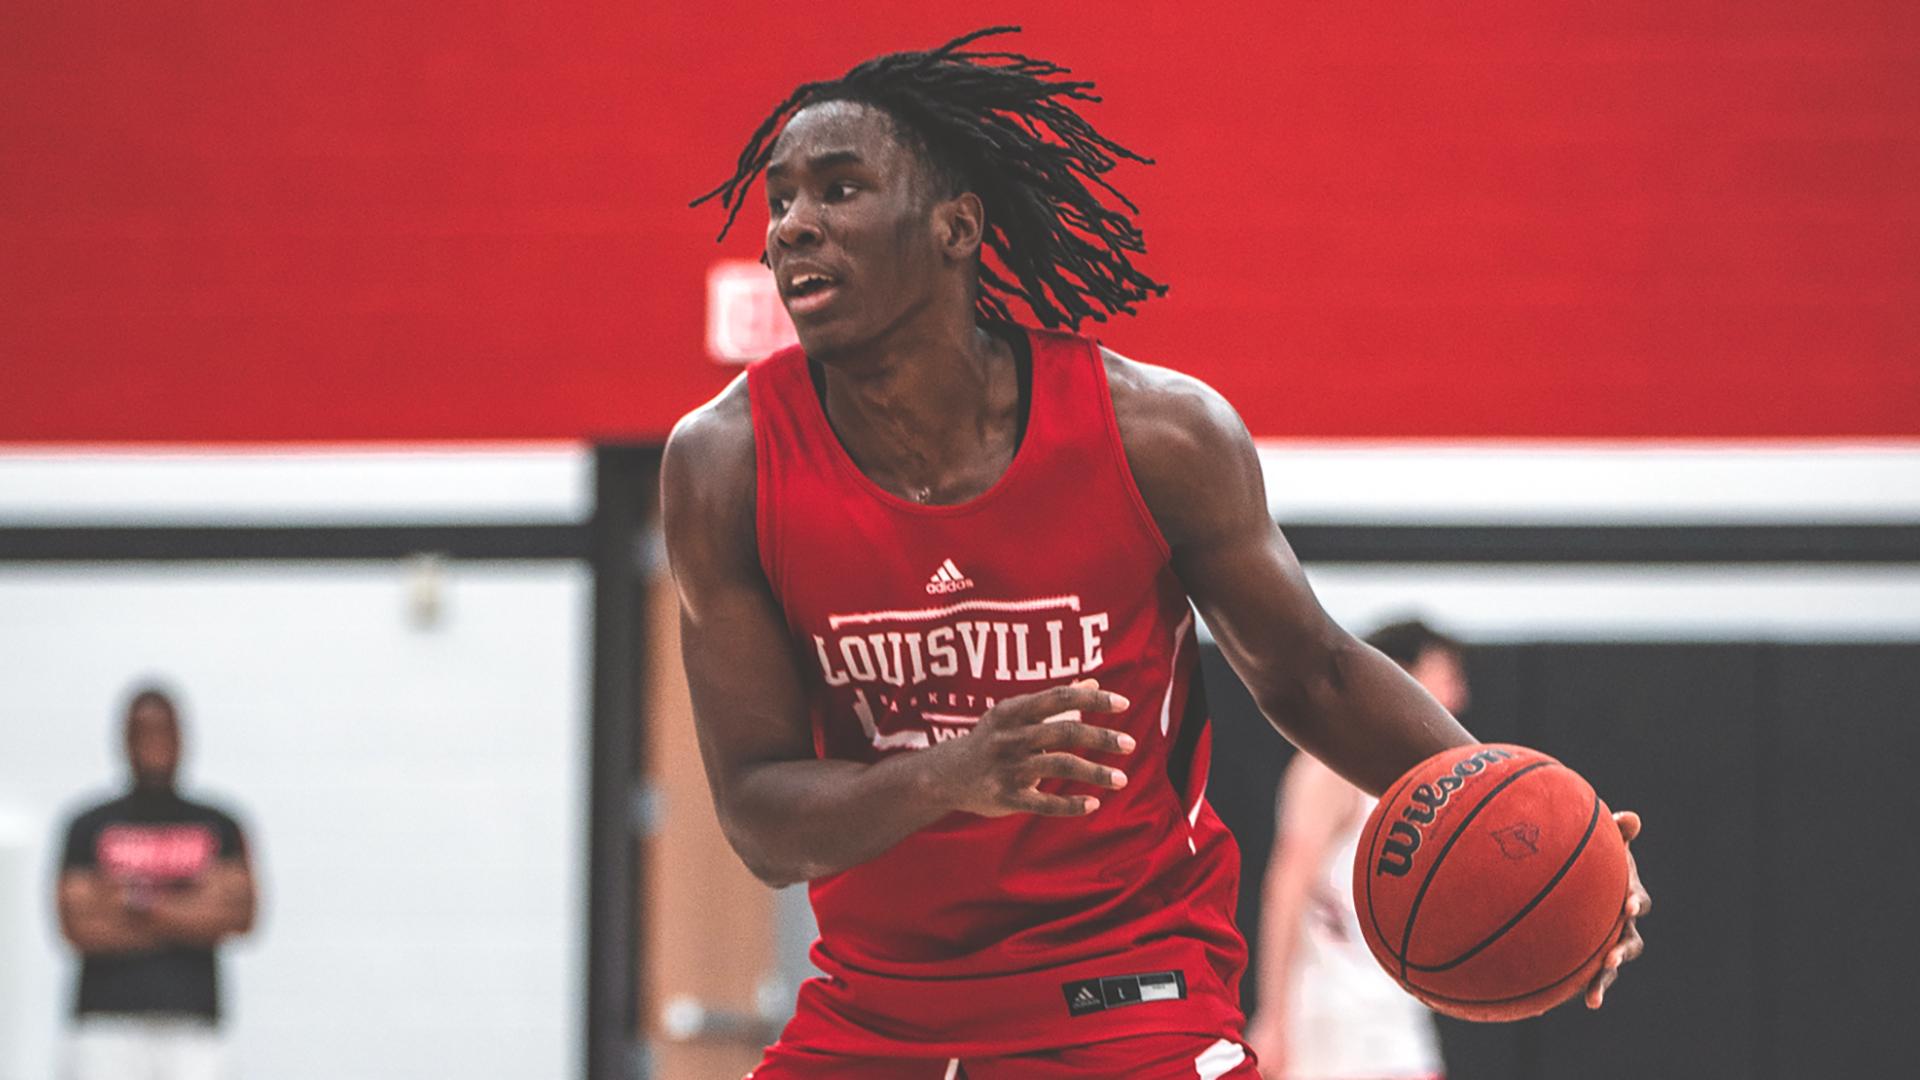 Louisville freshman Mike James to miss 2021-22 basketball season with torn Achilles tendon